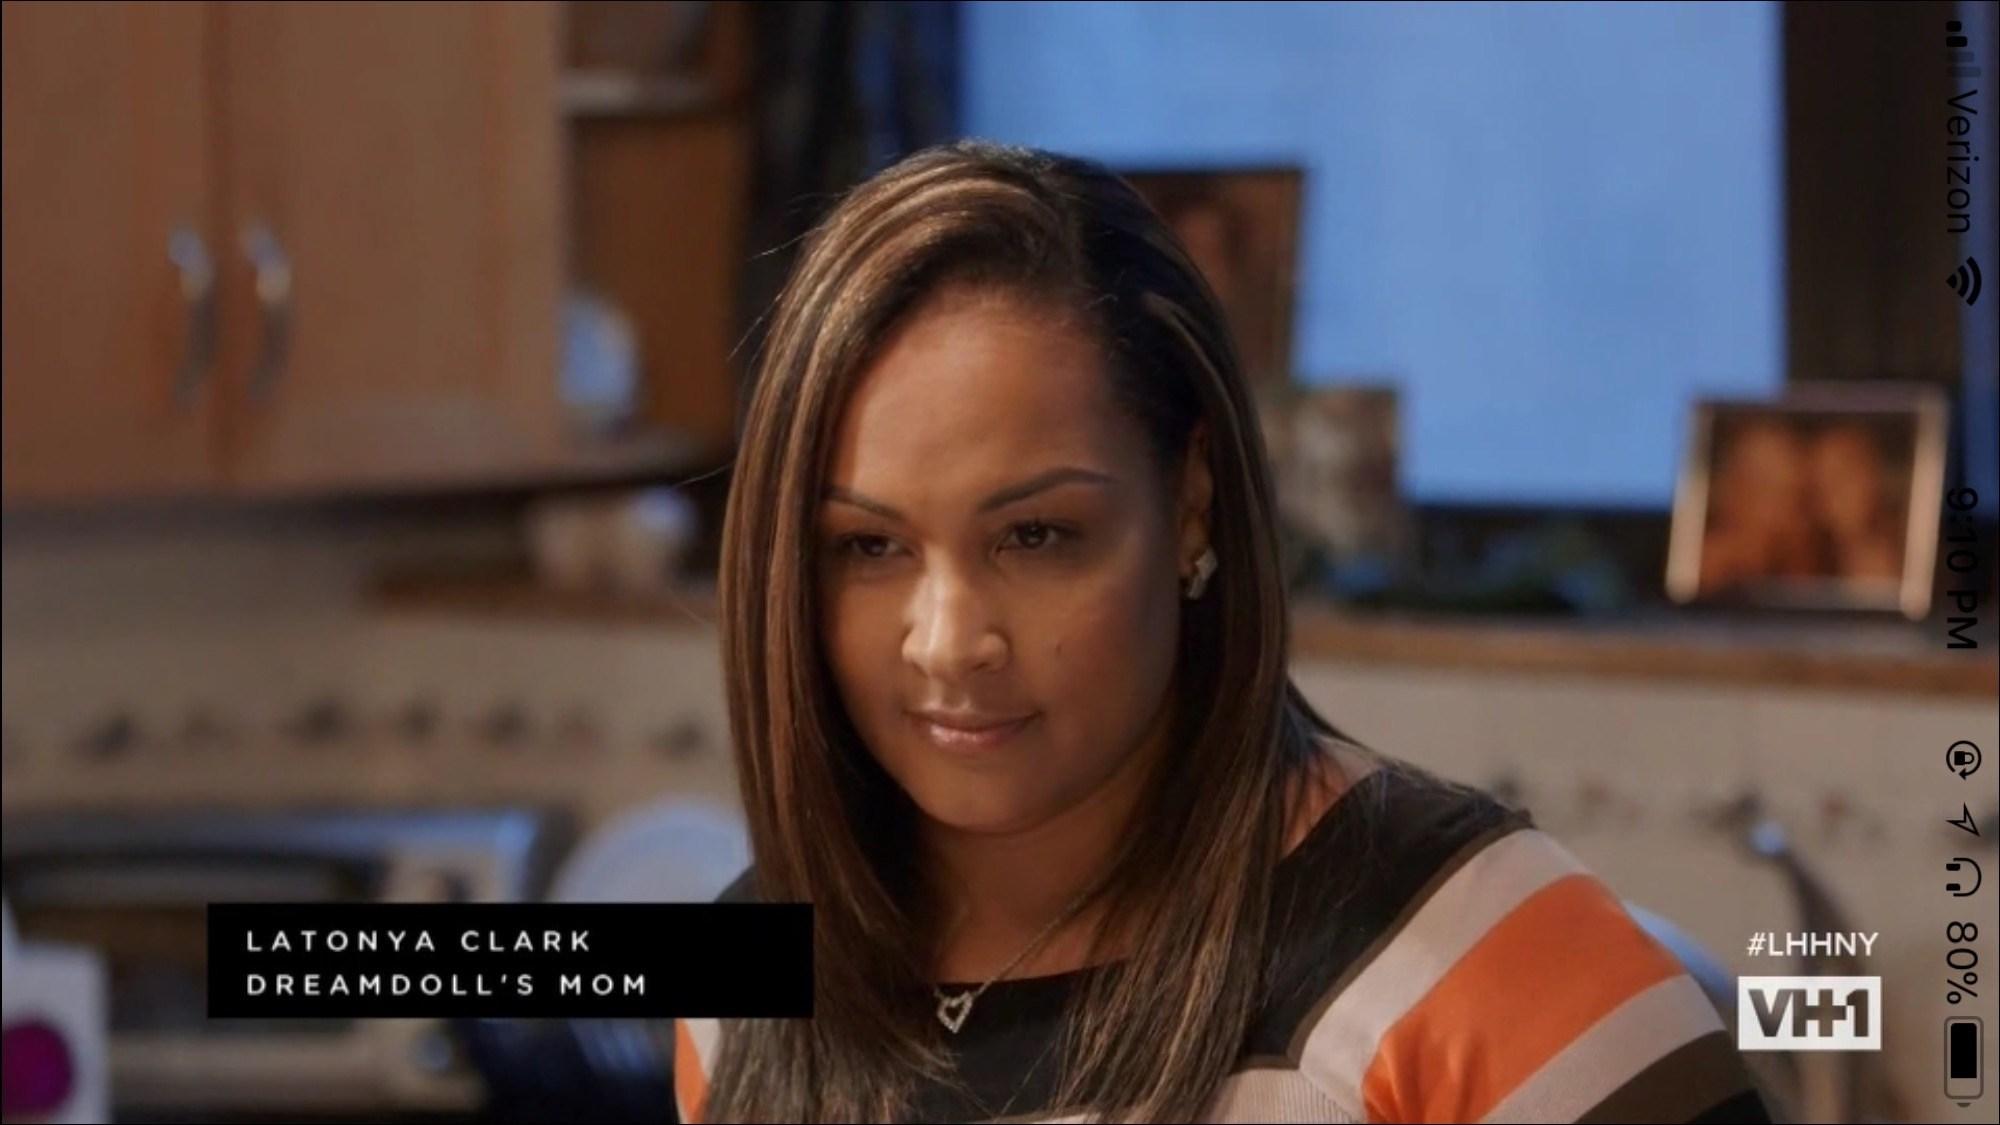 Latonya Clark Dream Doll Mom